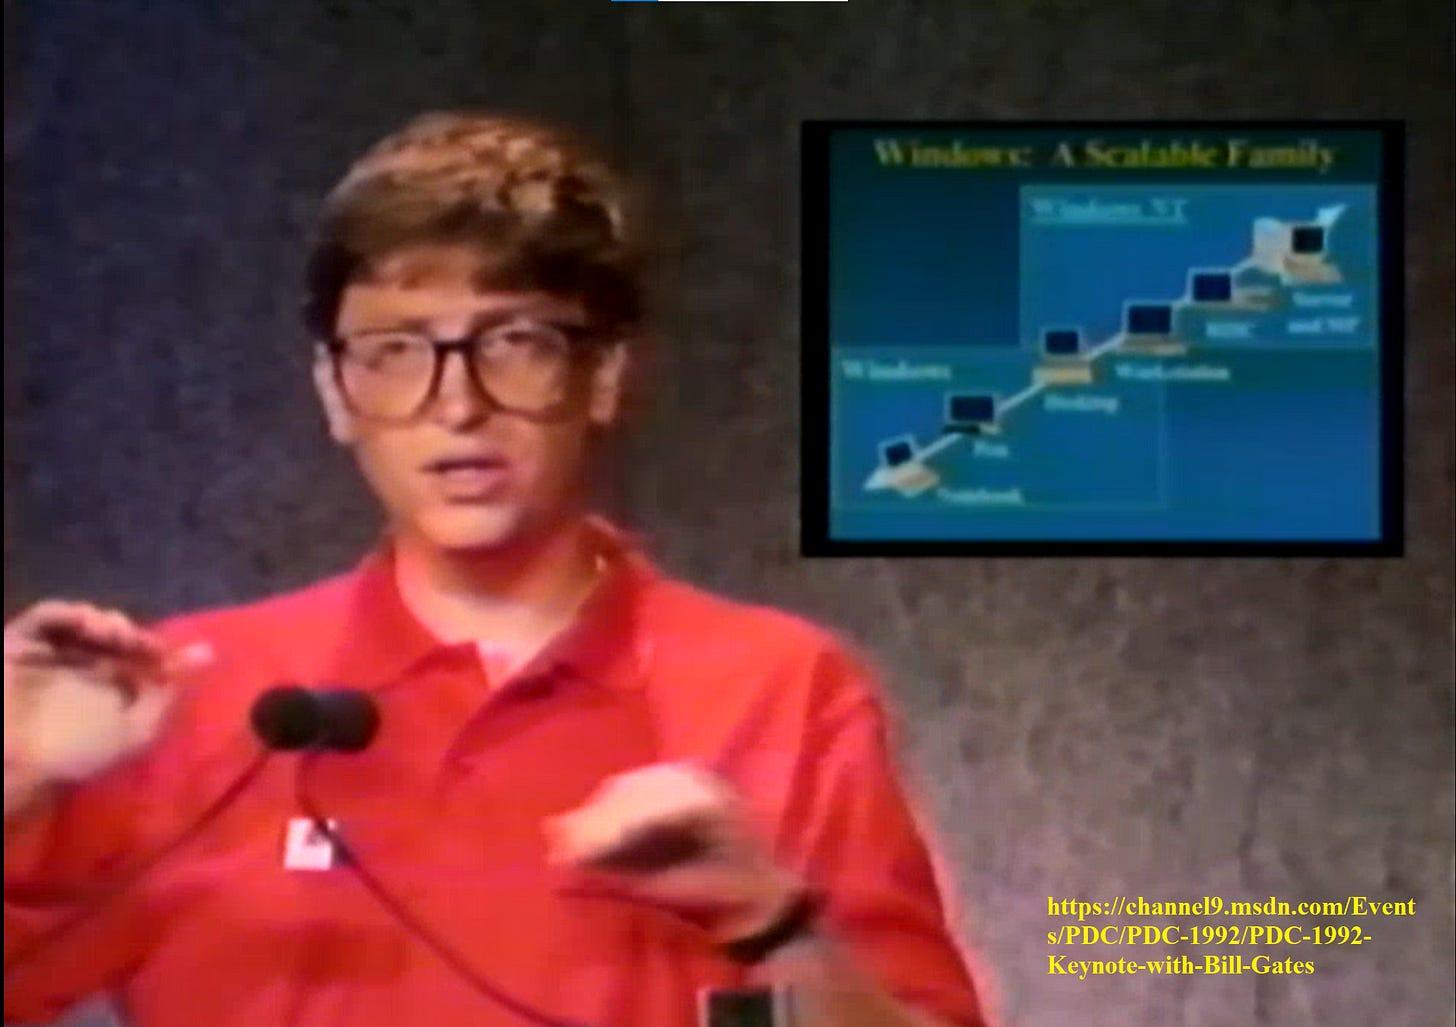 Bill Gates presenting Windows NT 3.1